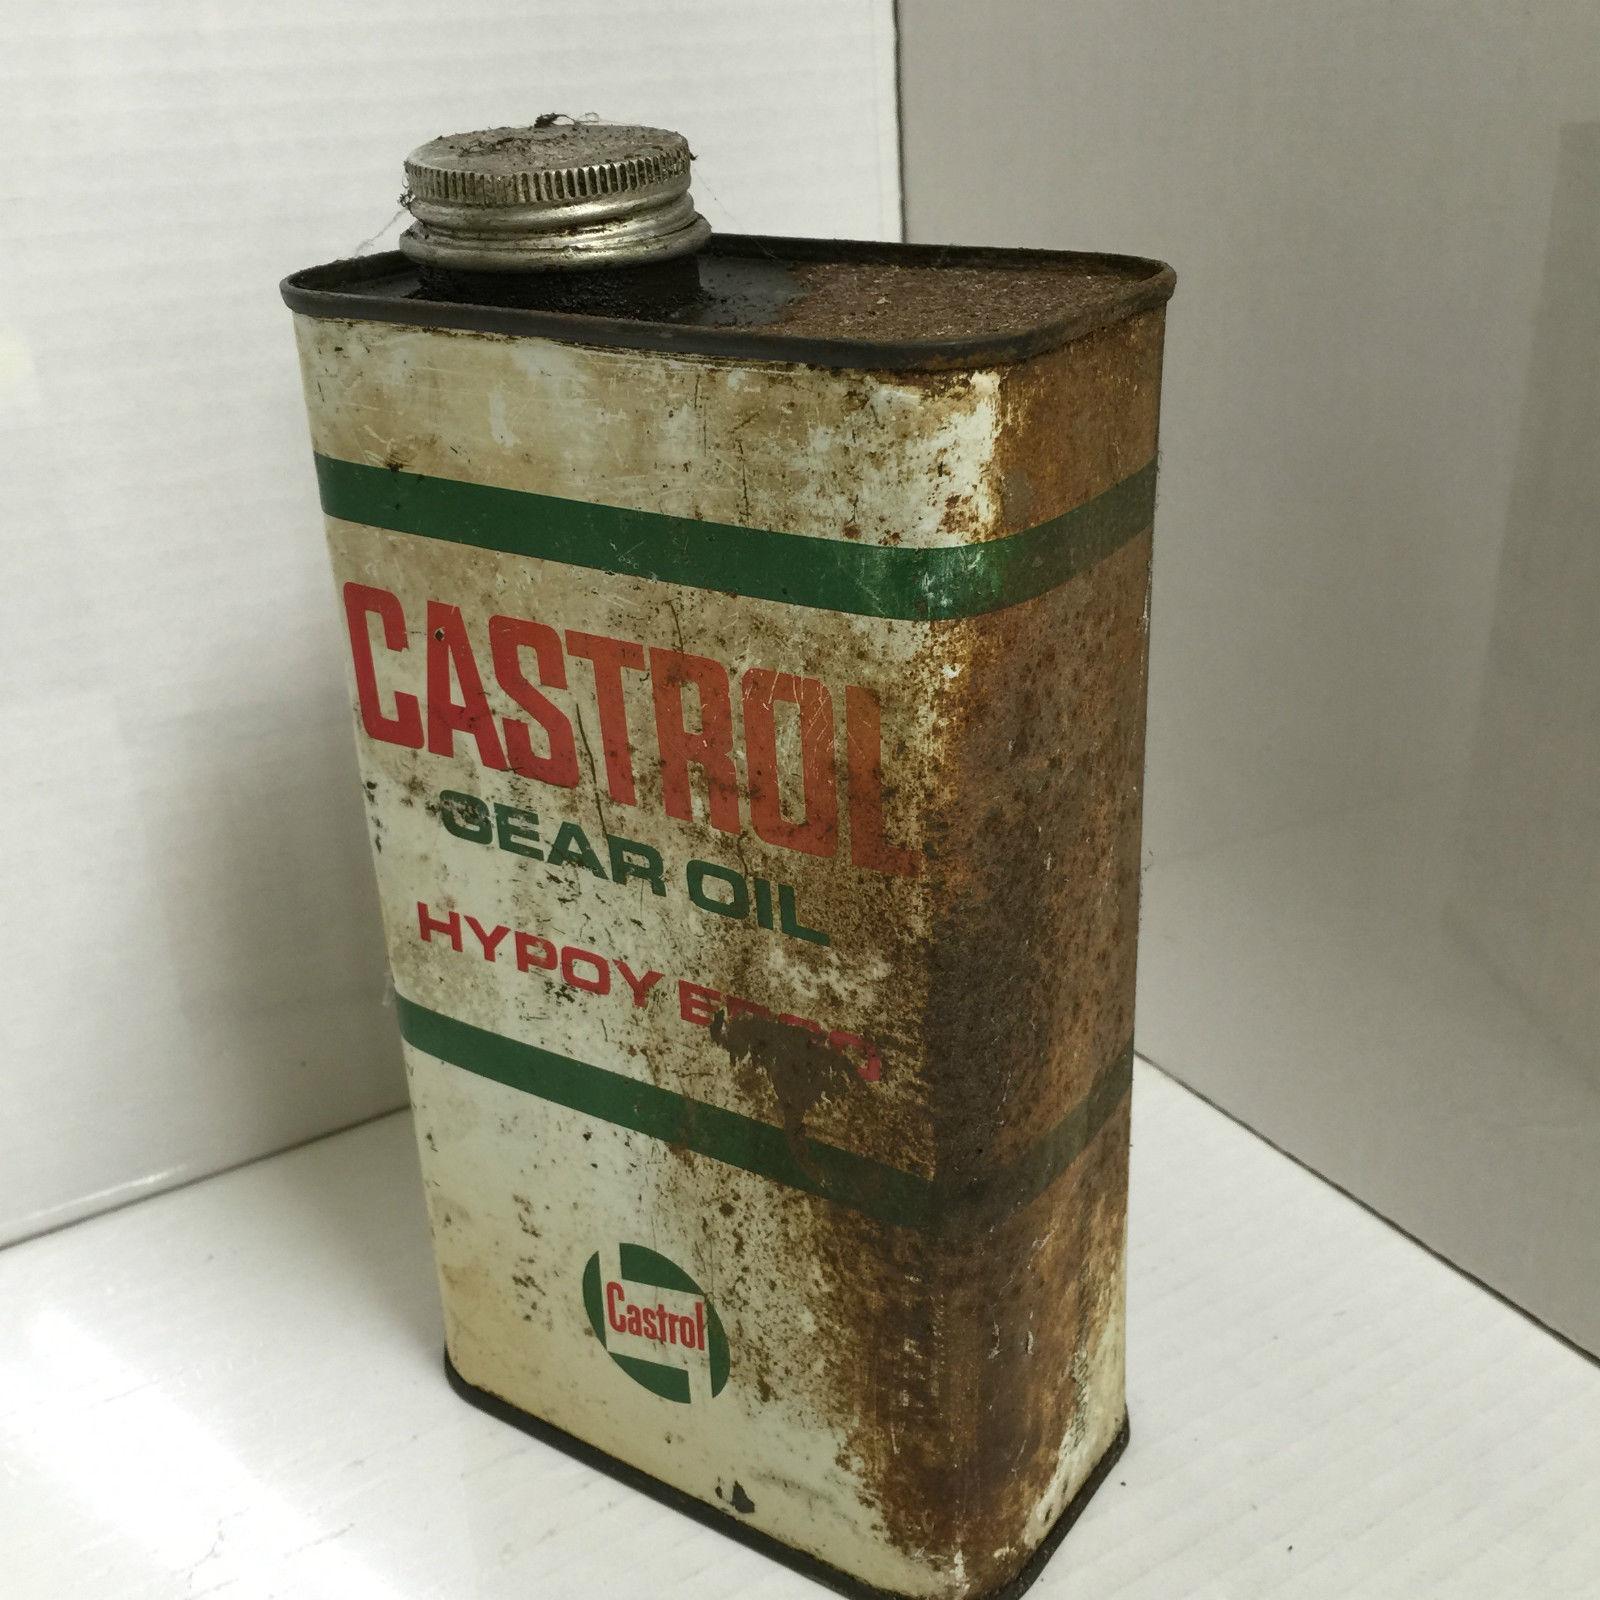 Castrol Gear Oil Can